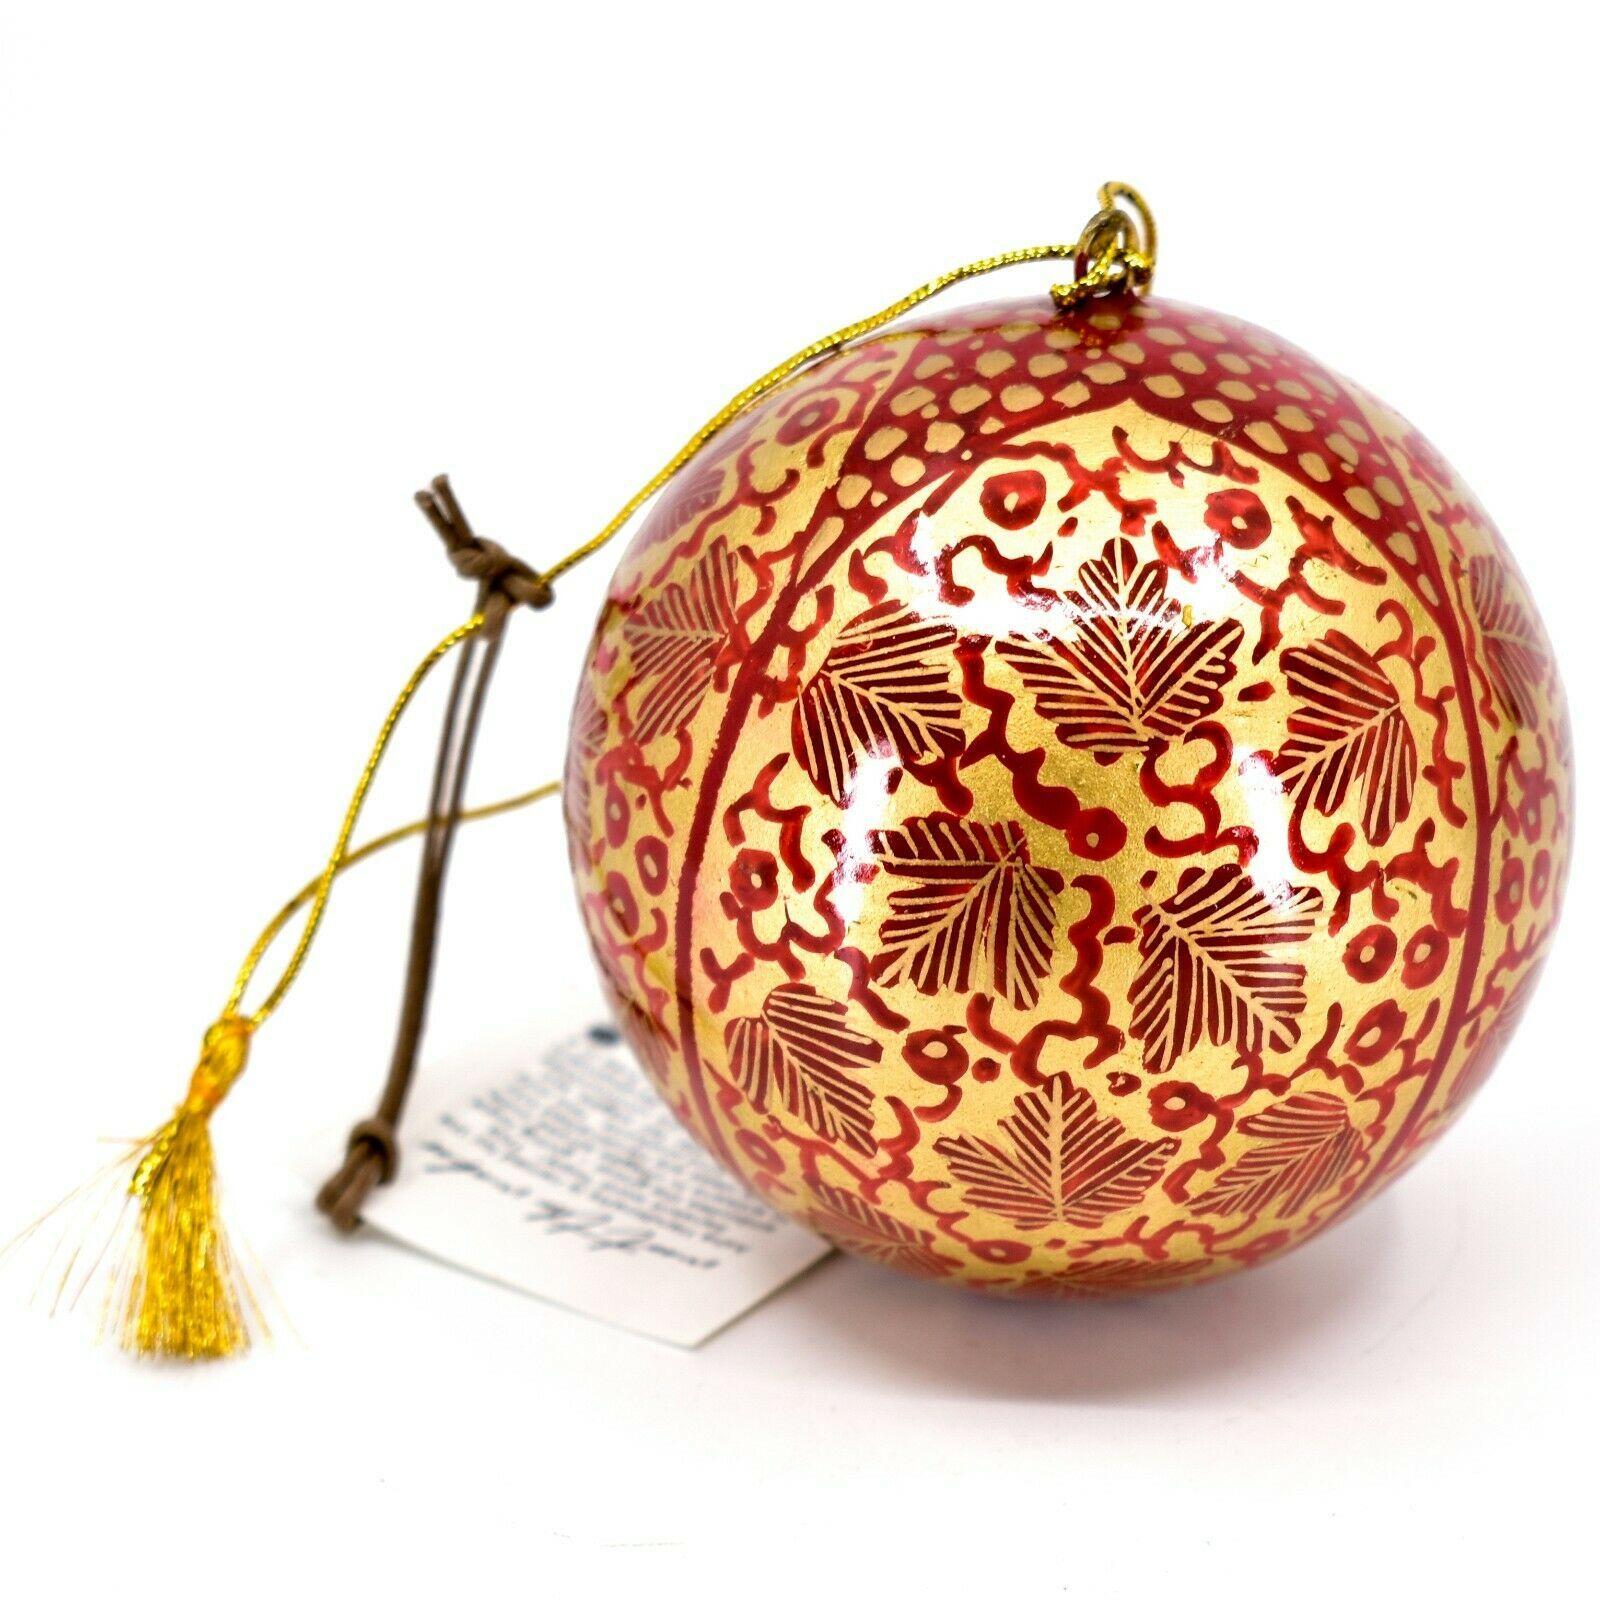 Asha Handicrafts Painted Papier-Mâché Red Gold Chinar Leaves Christmas Ornament